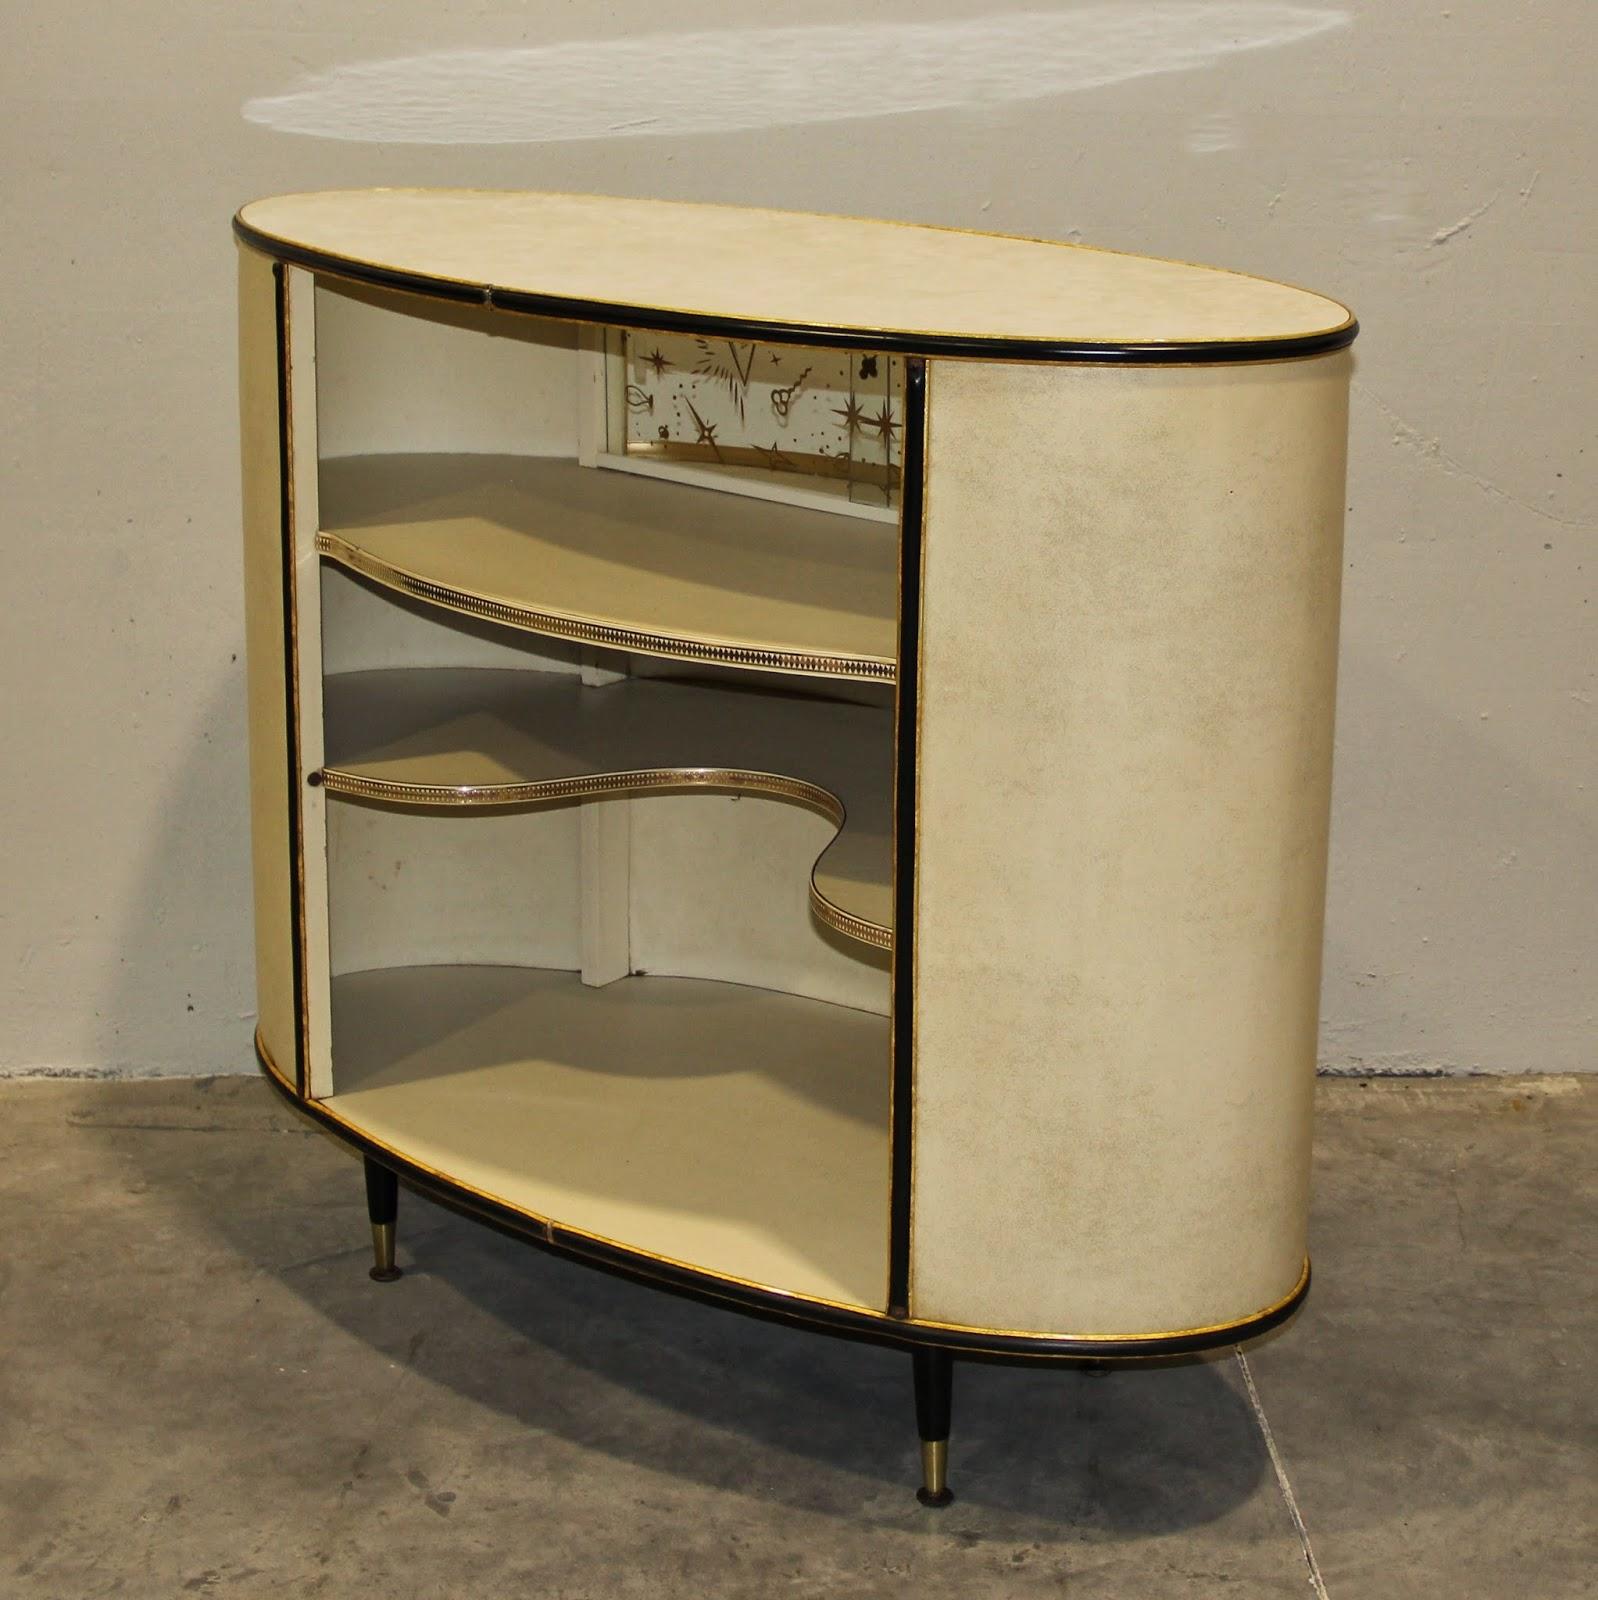 Odalisca madrid art nouveau art deco dise o del siglo xx vintage mueble bar de los a os 60 - Mueble barra bar ...